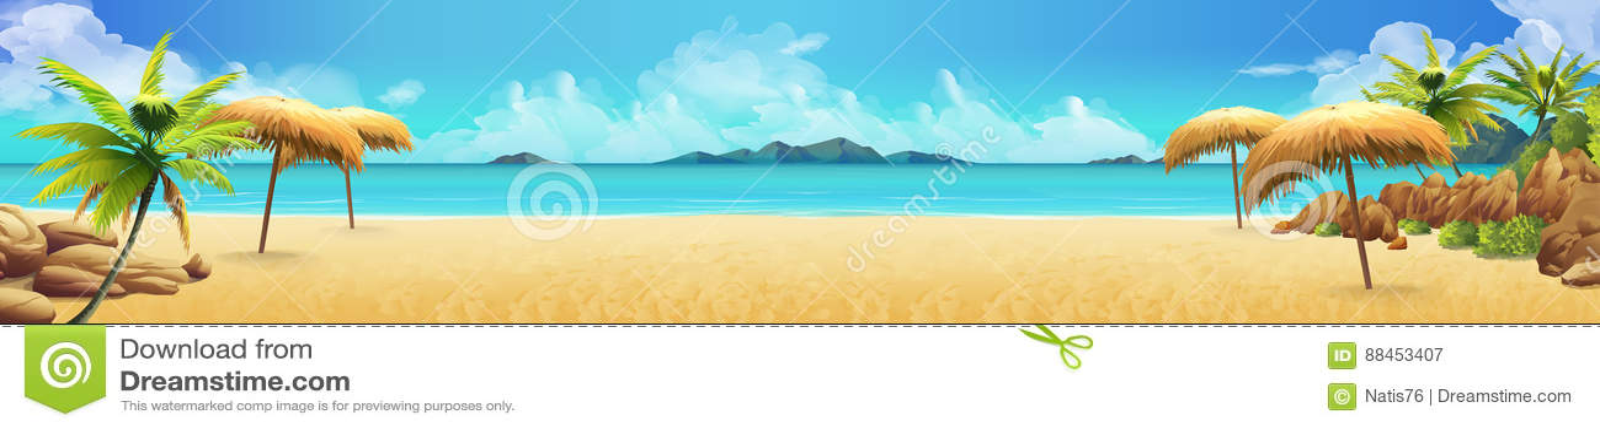 Panorama do mar, praia tropical Vetor